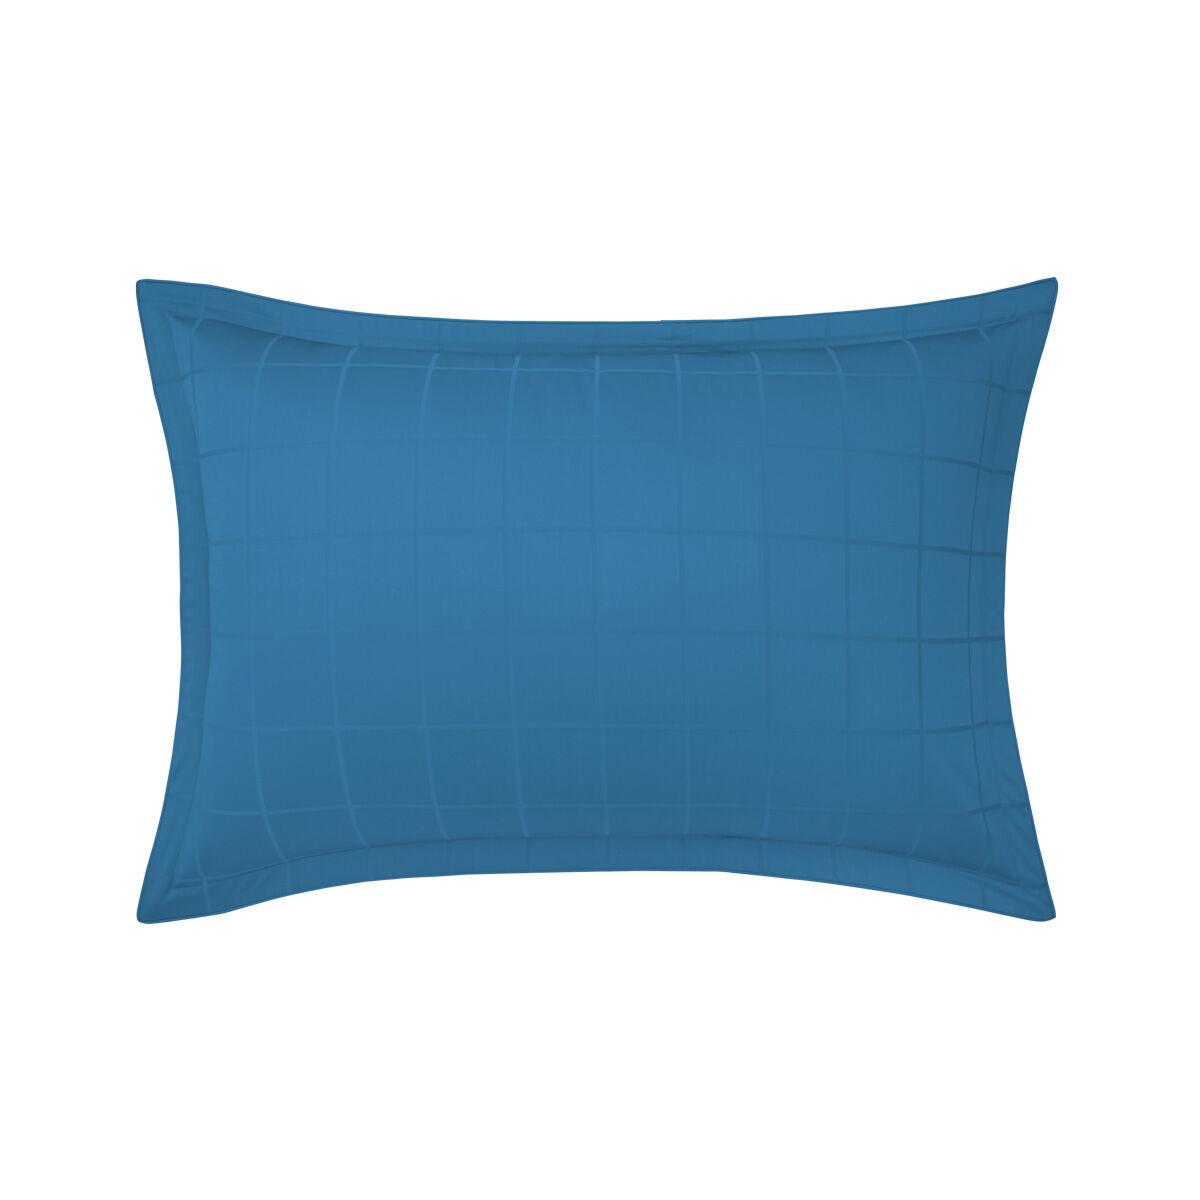 Olivier Desforges Taie d'oreiller satin Bleu 50 x 75 cm